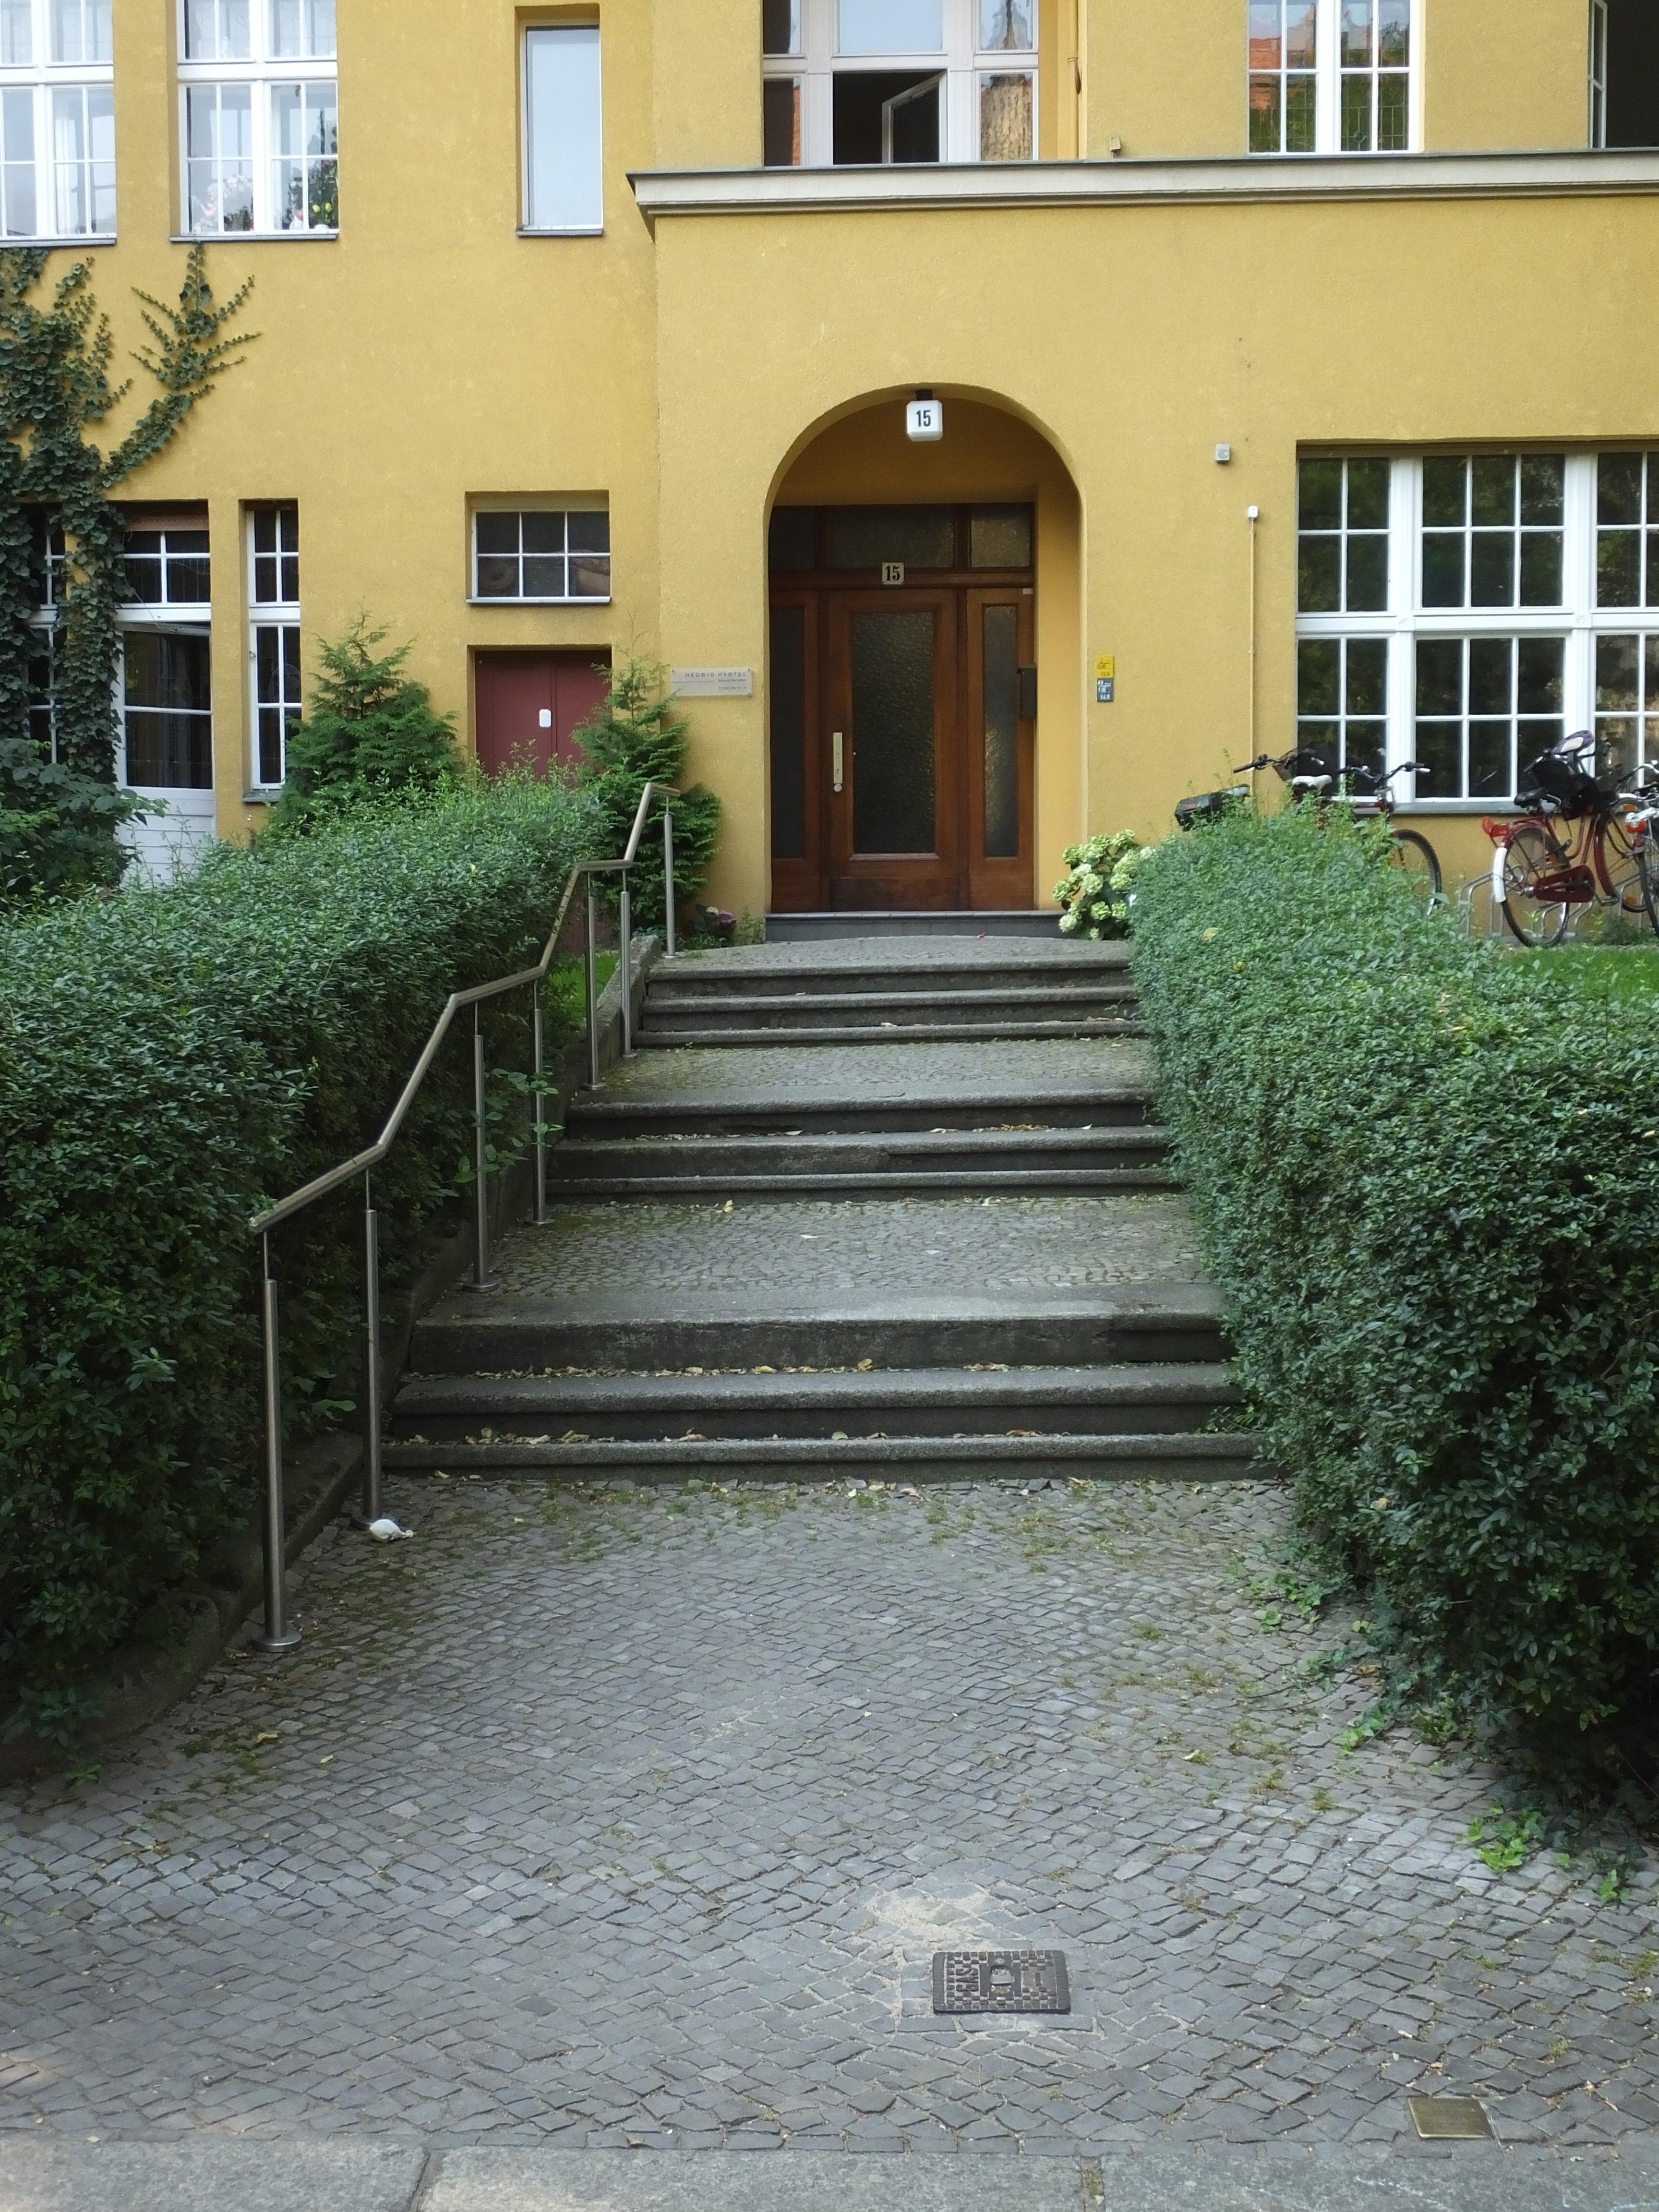 Landauer Berlin